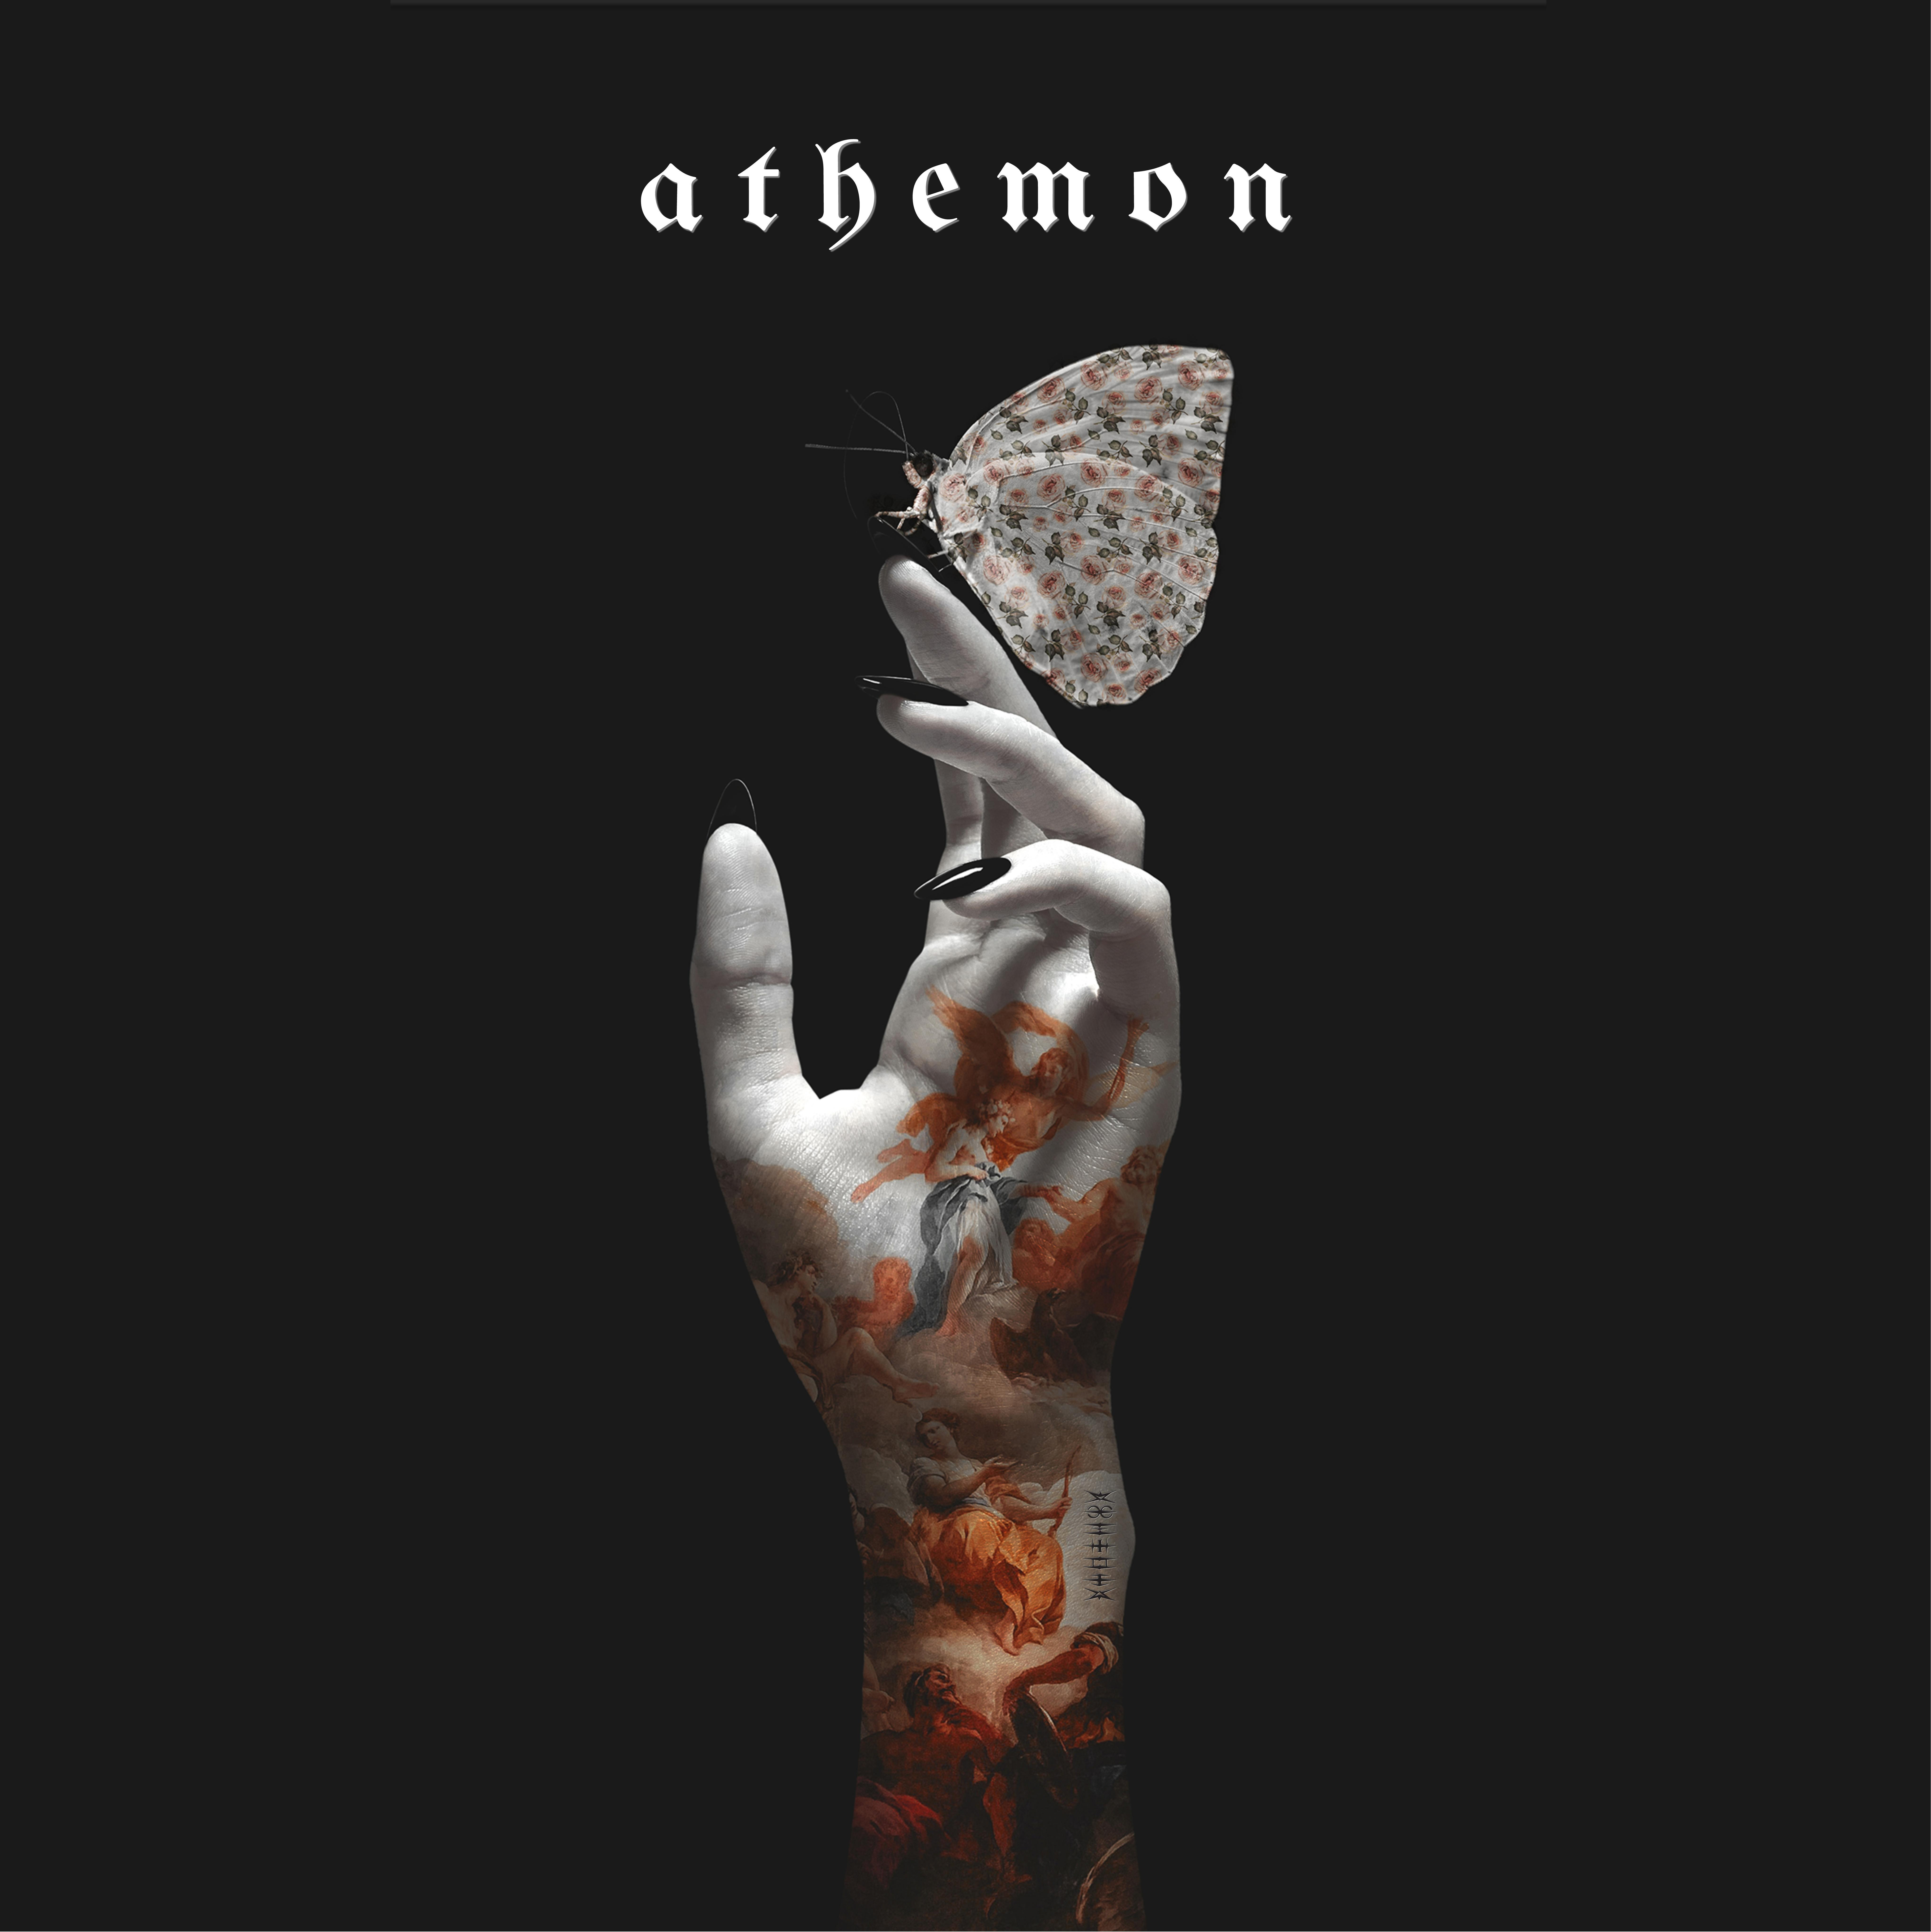 Aethemon